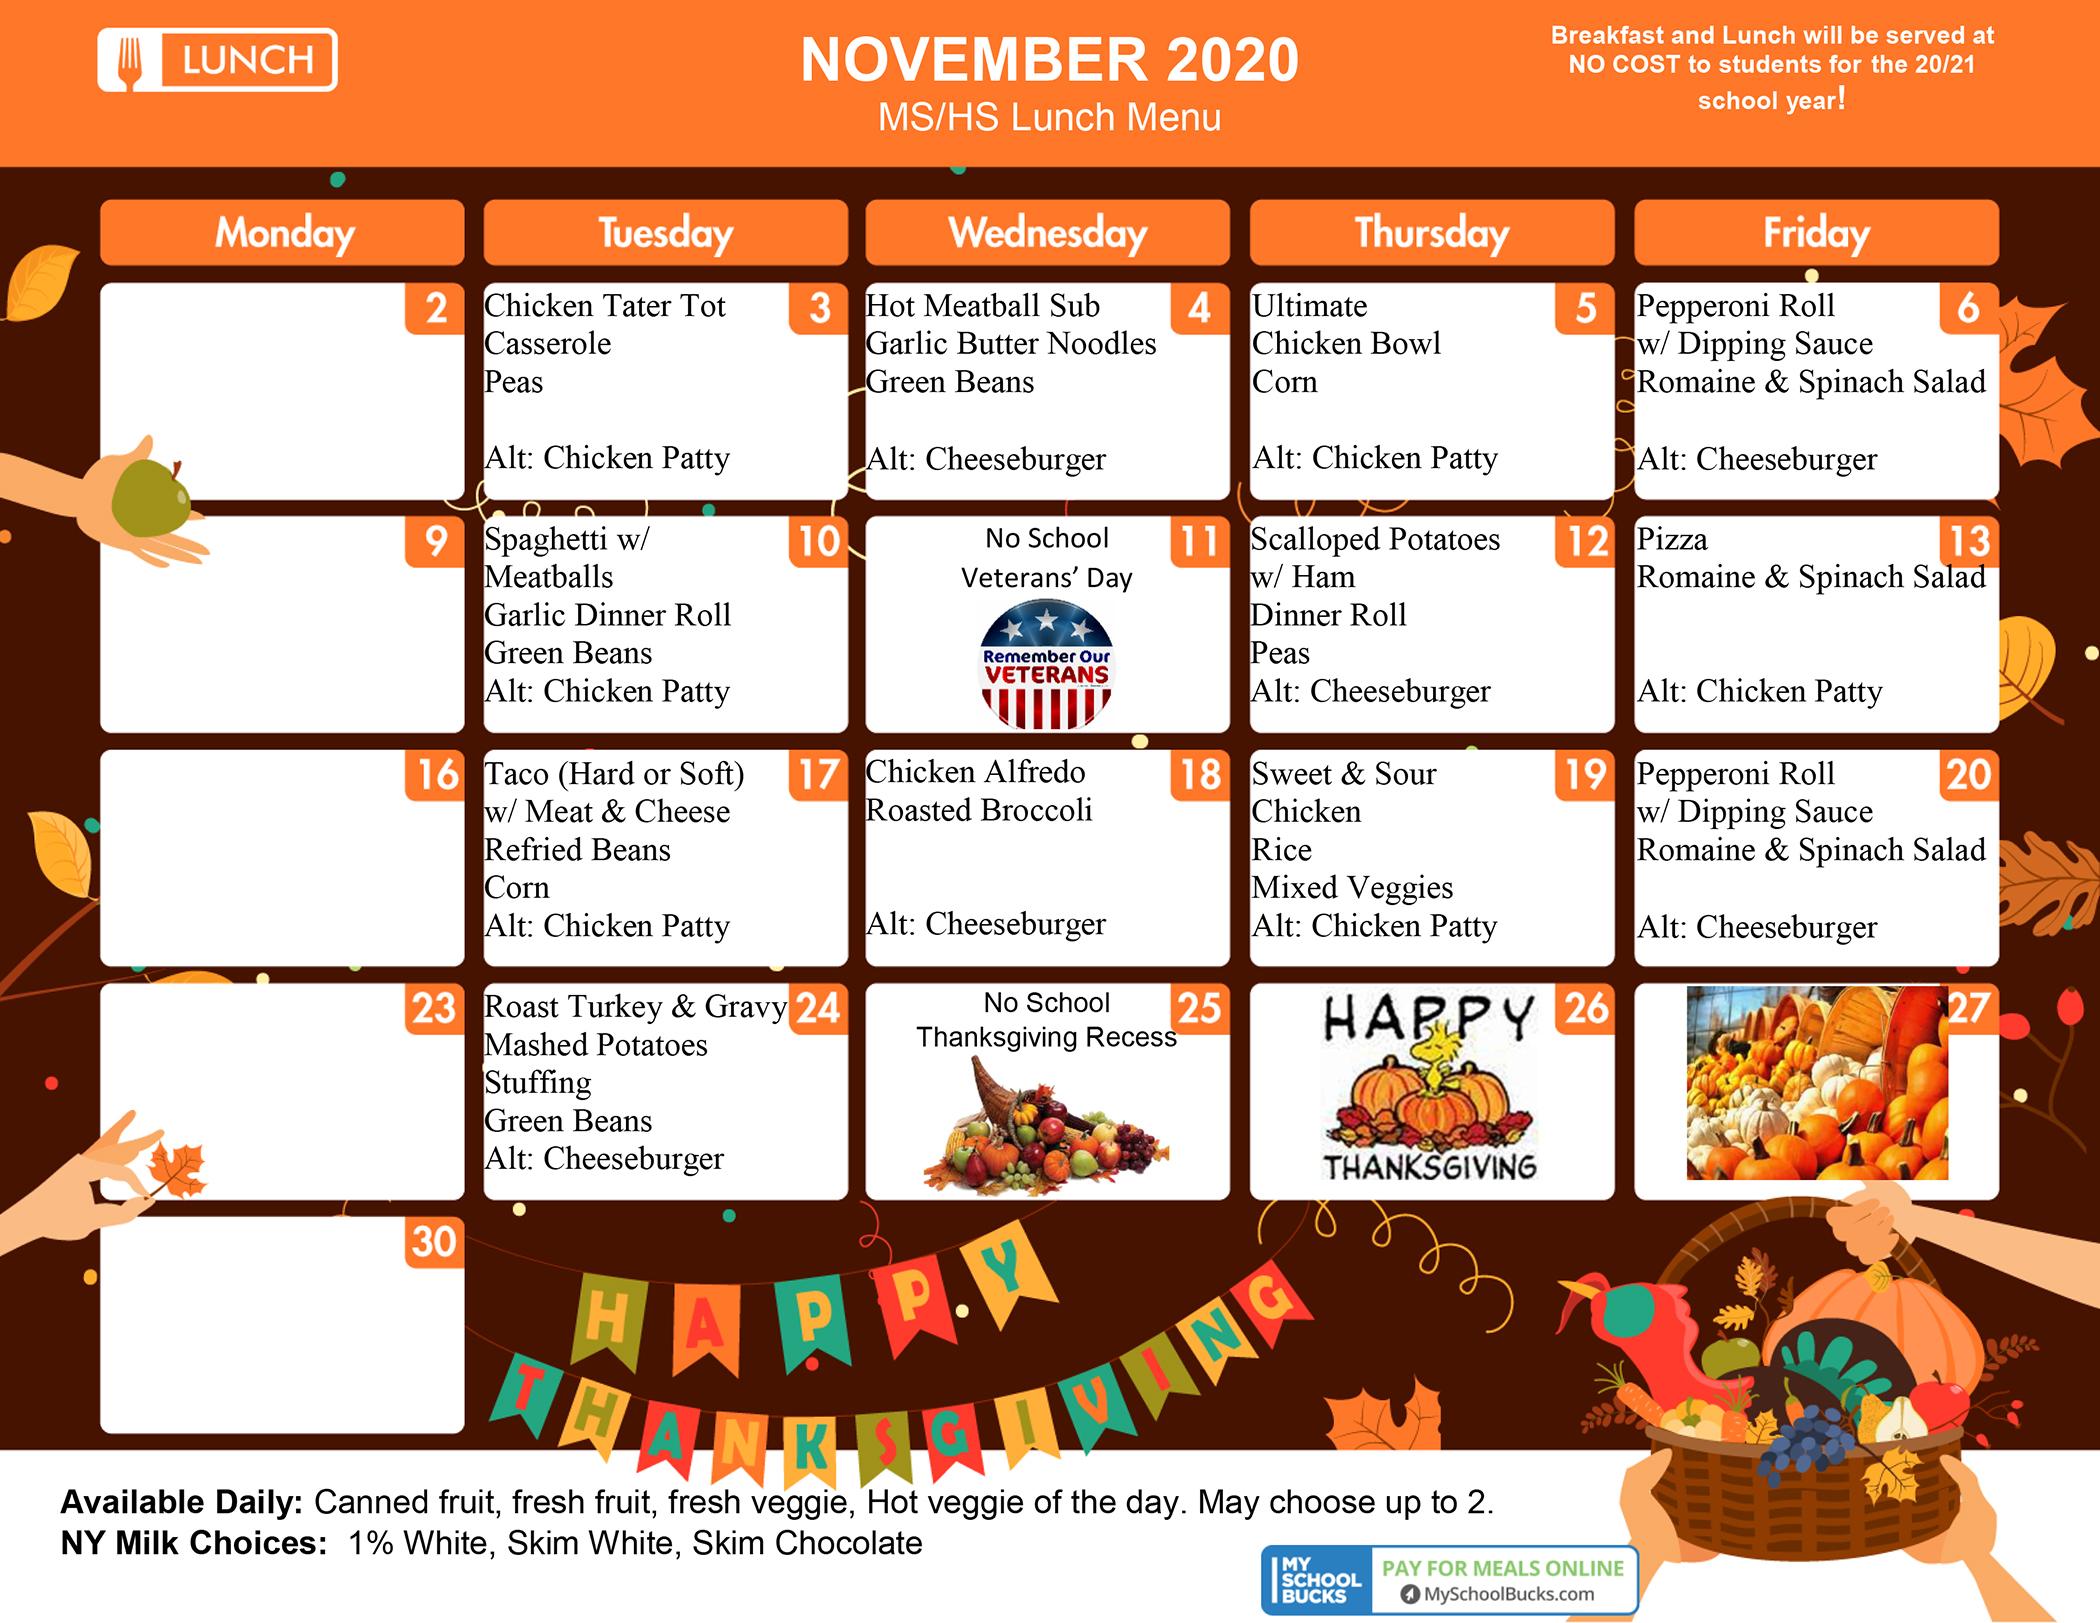 SEMS/SEHS Lunch Menu (November 2020)